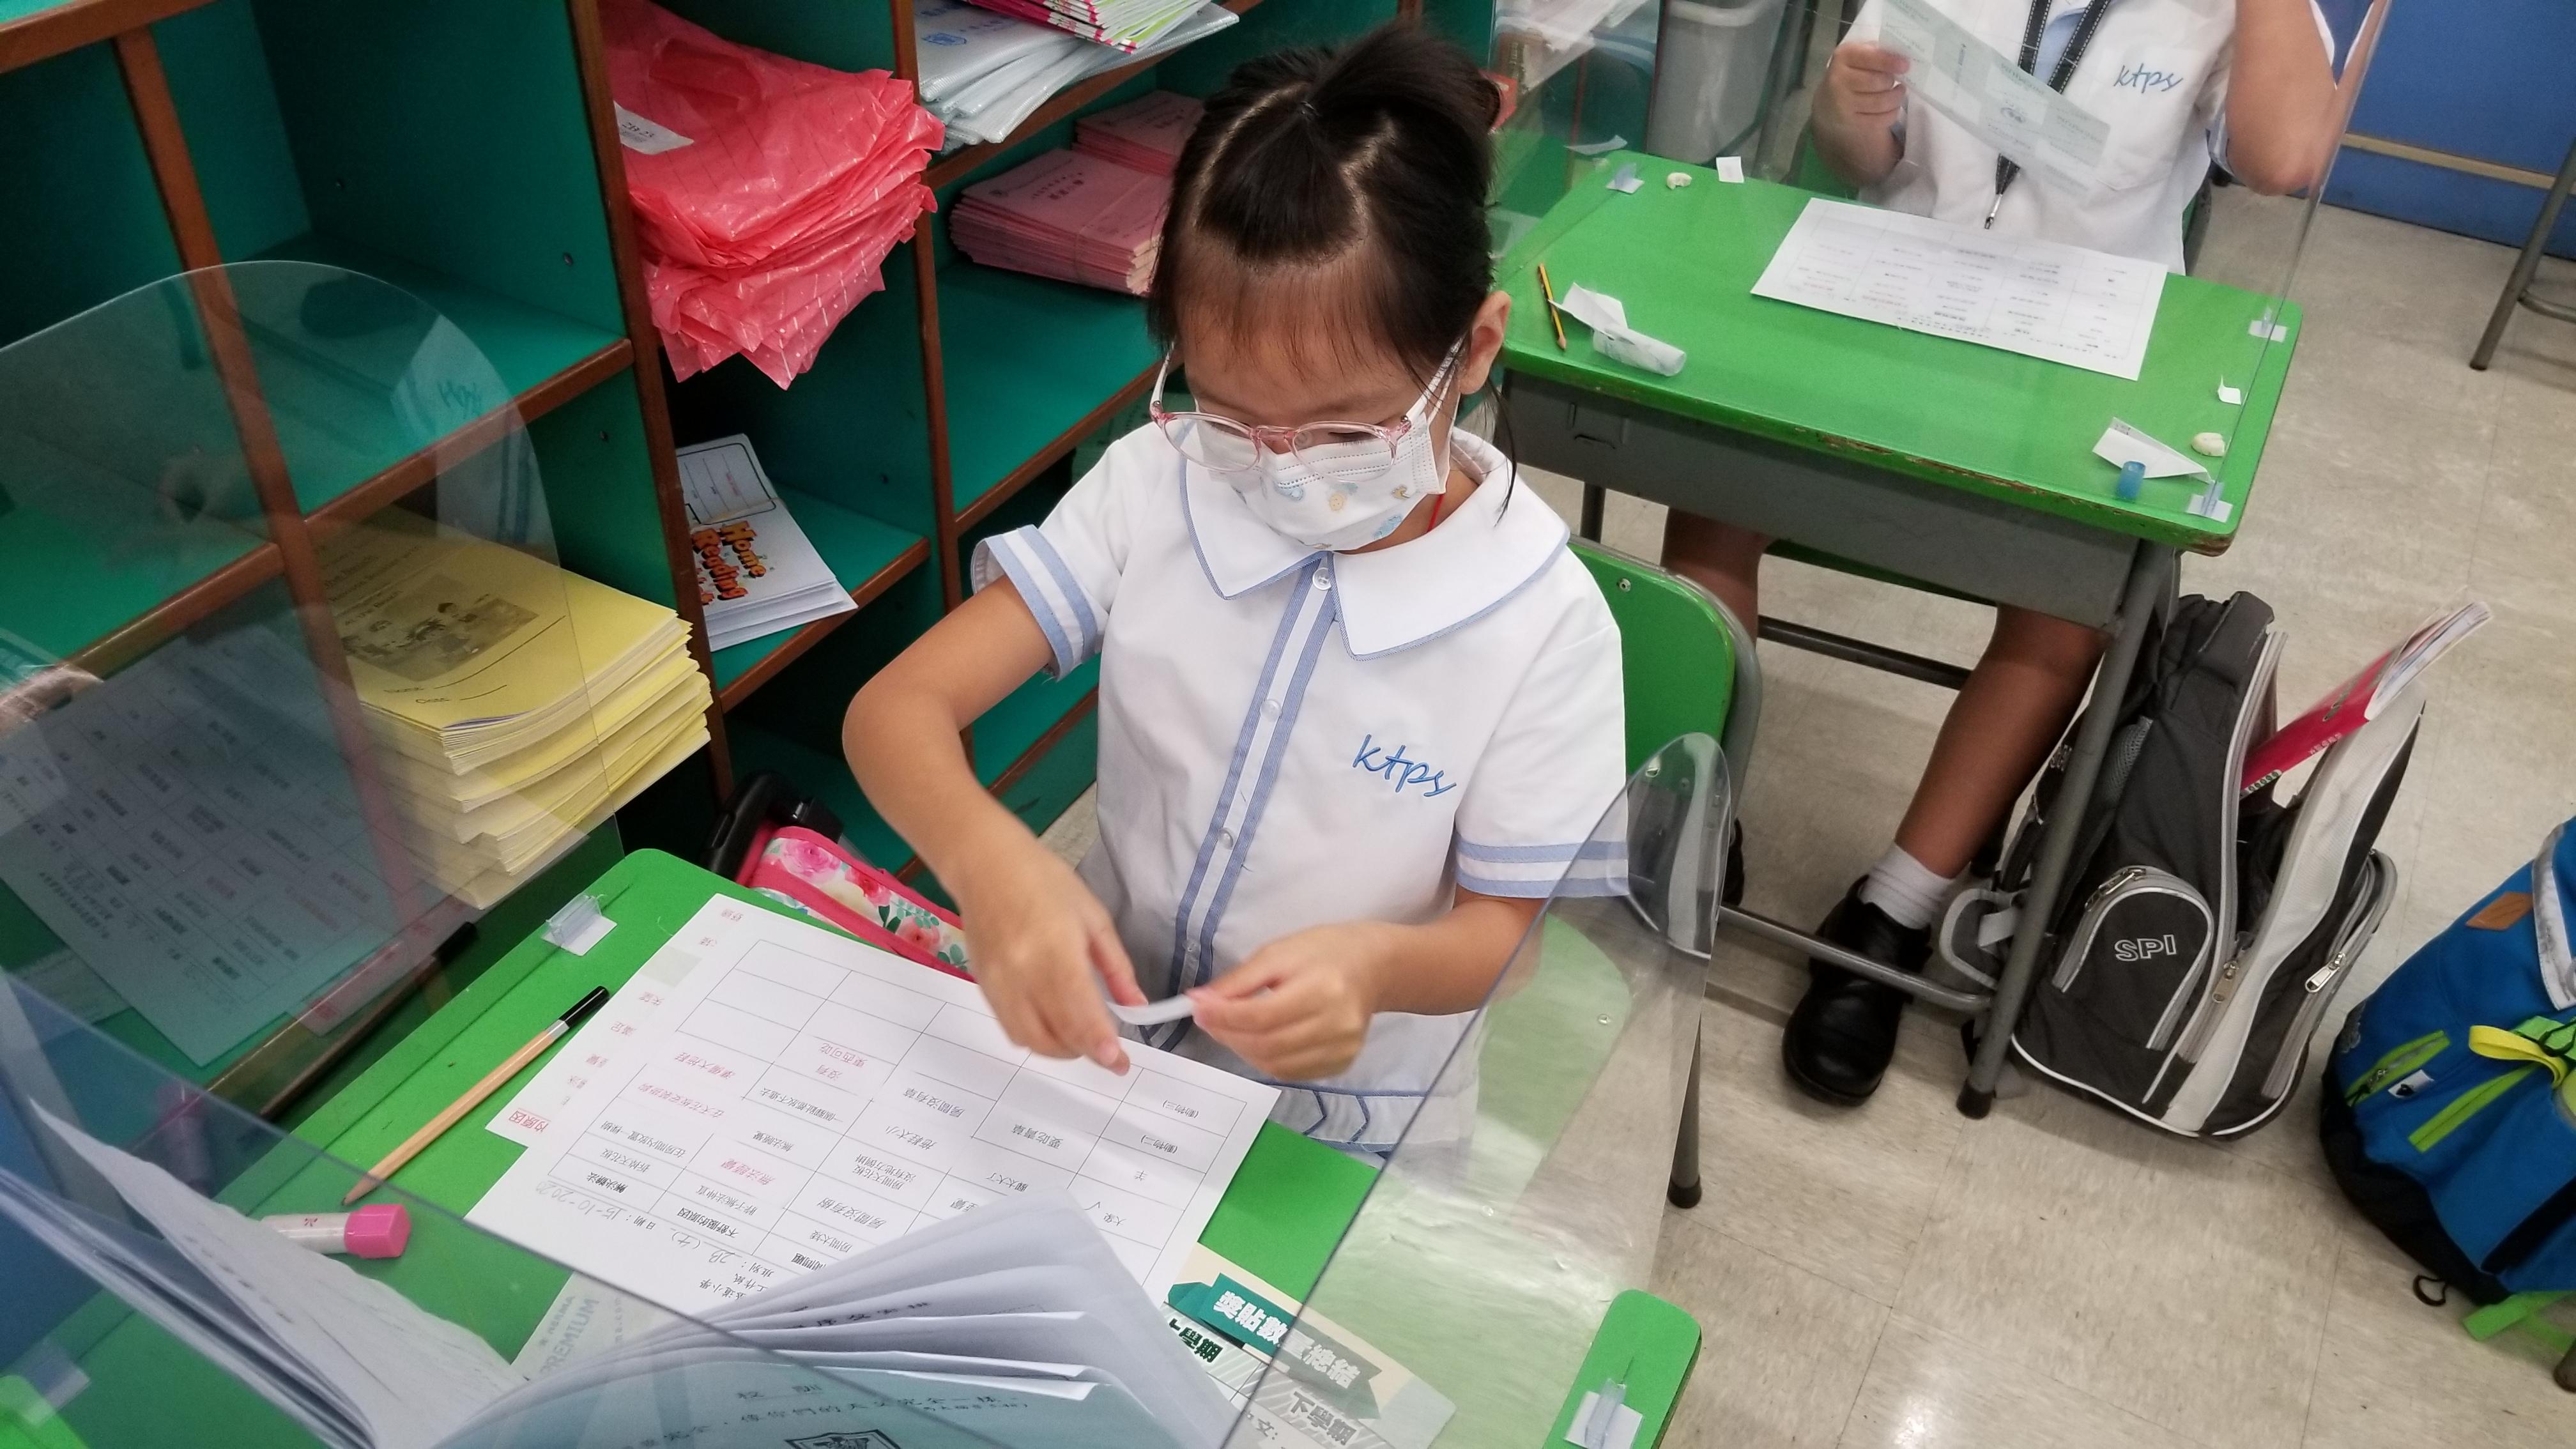 http://keito.school.hk/sites/default/files/20201015_090303.jpg